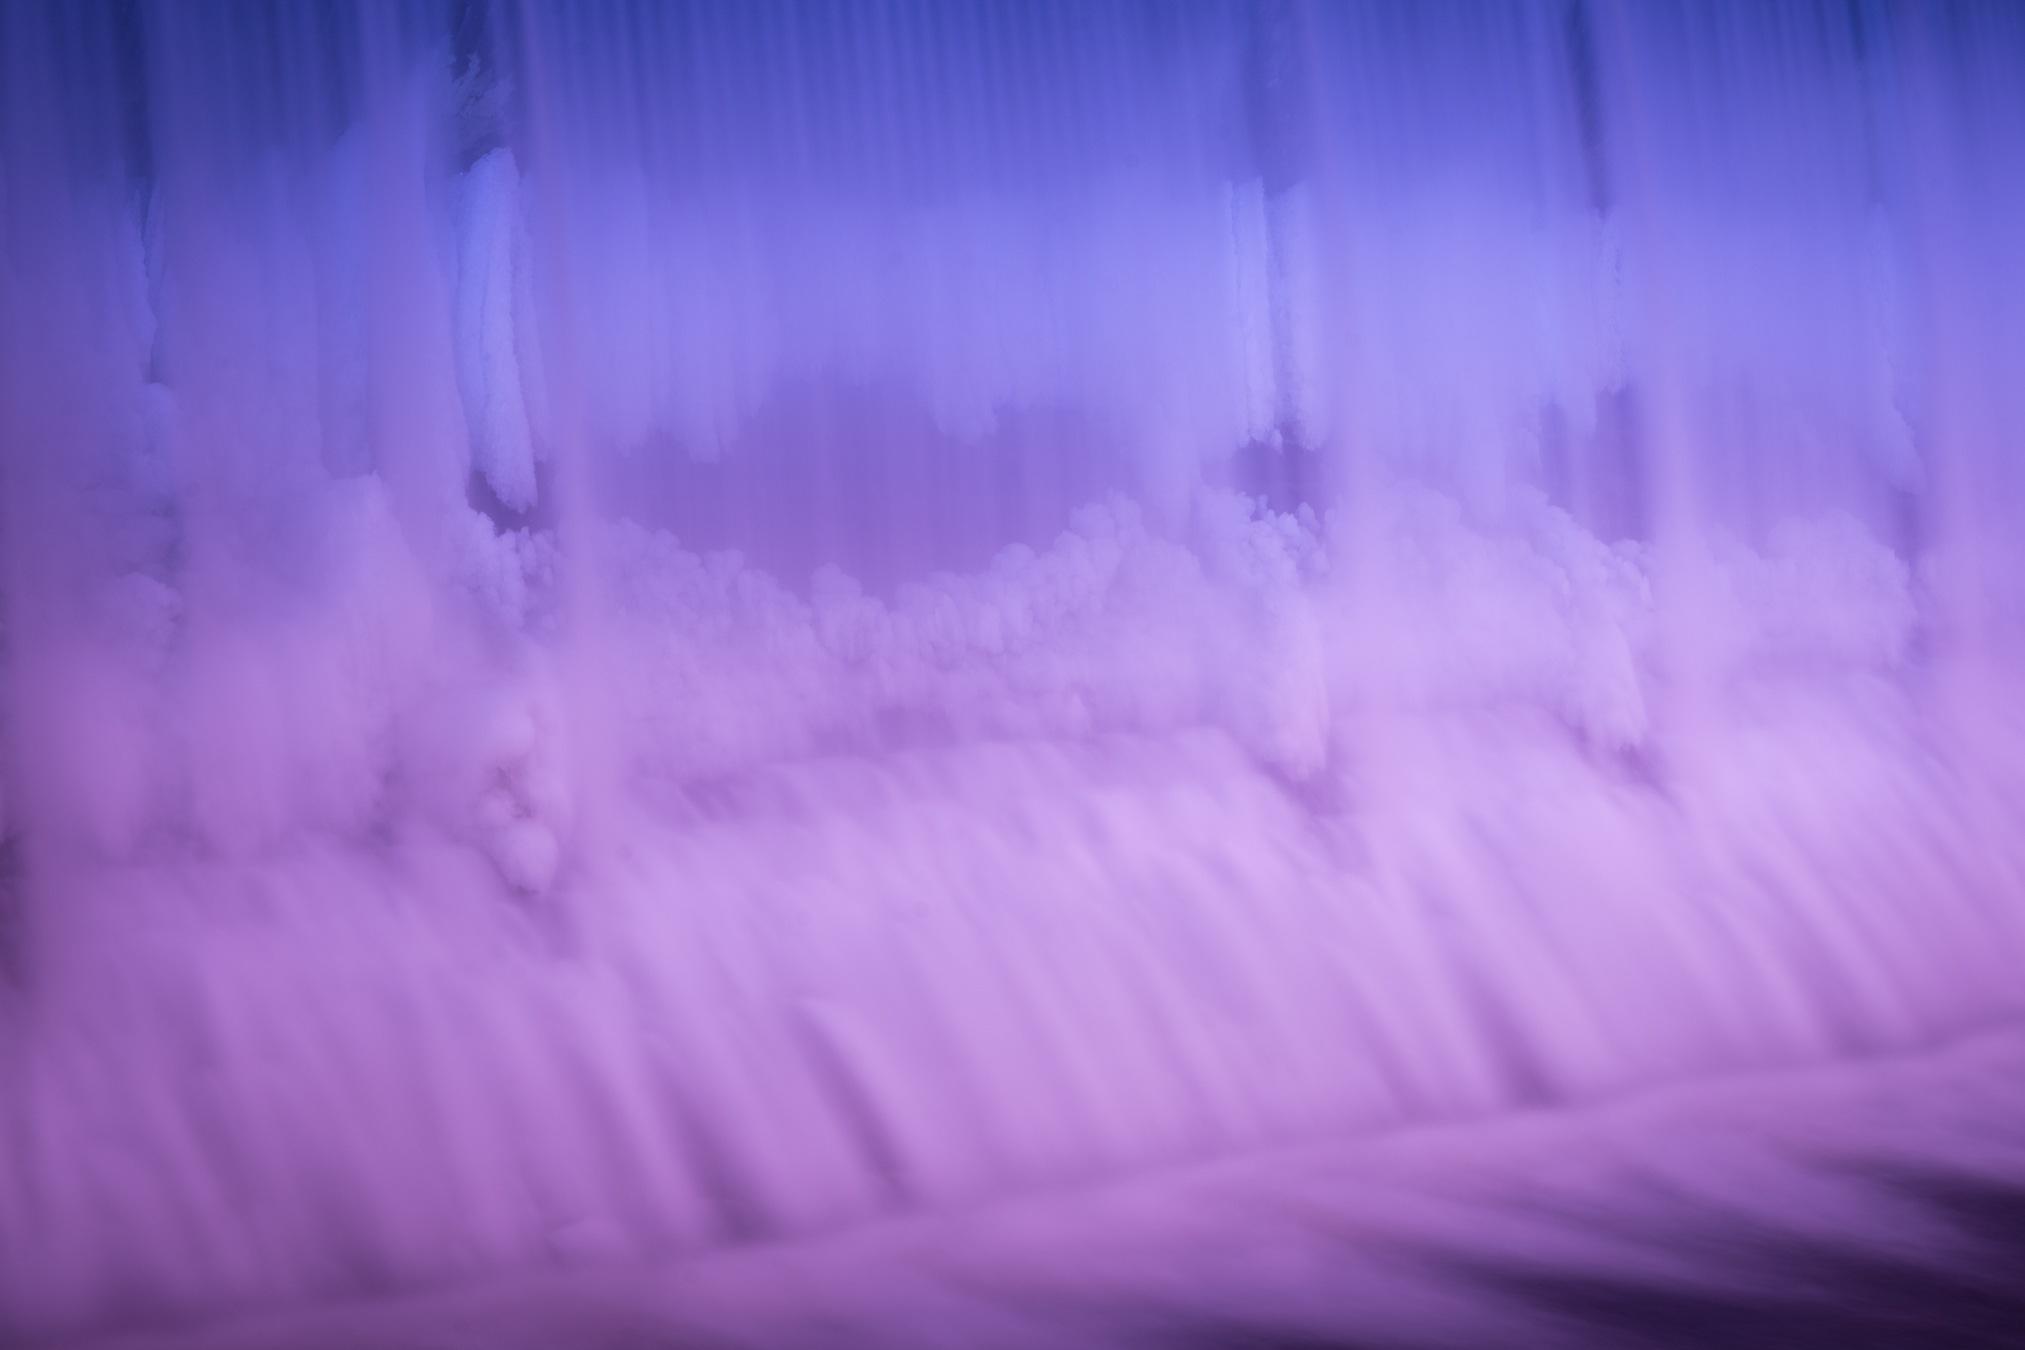 Pastel flow by Petri Pihlaja